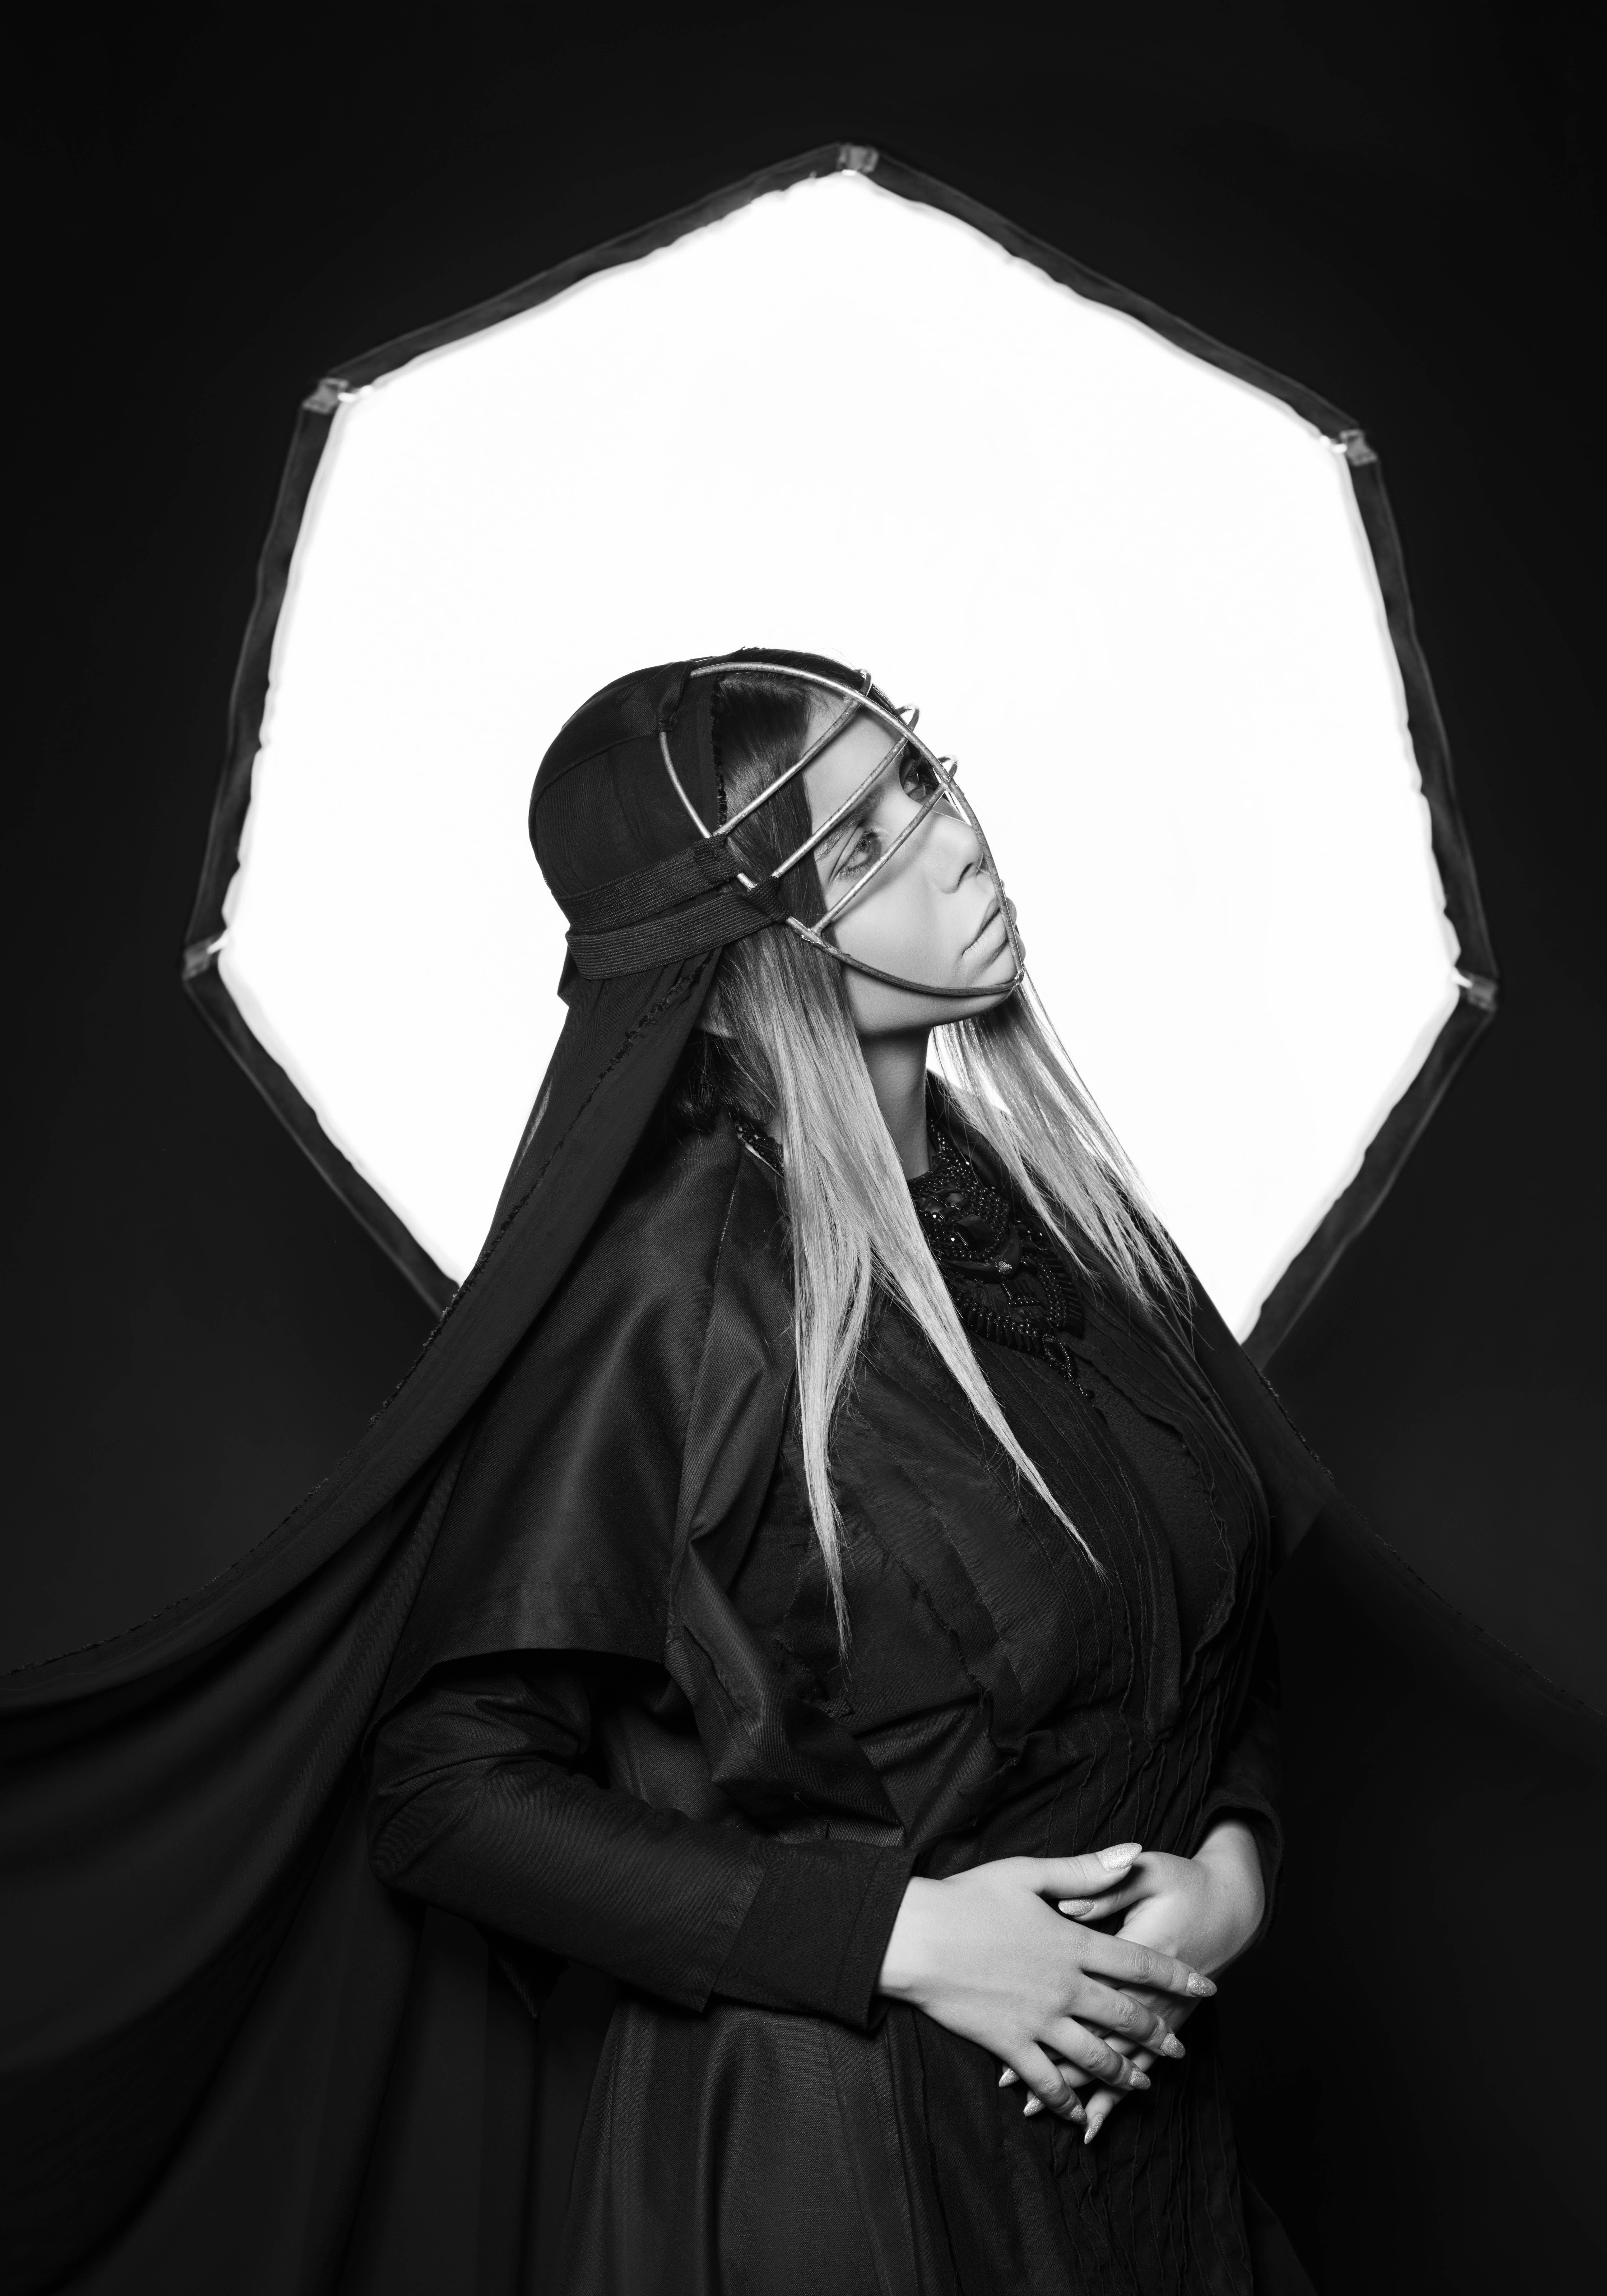 #mood #fineart  #portrait  #art  #fashion #35photo #artistic  #women #men #design #mask #dress #conceptual, hamze dashtrazmi